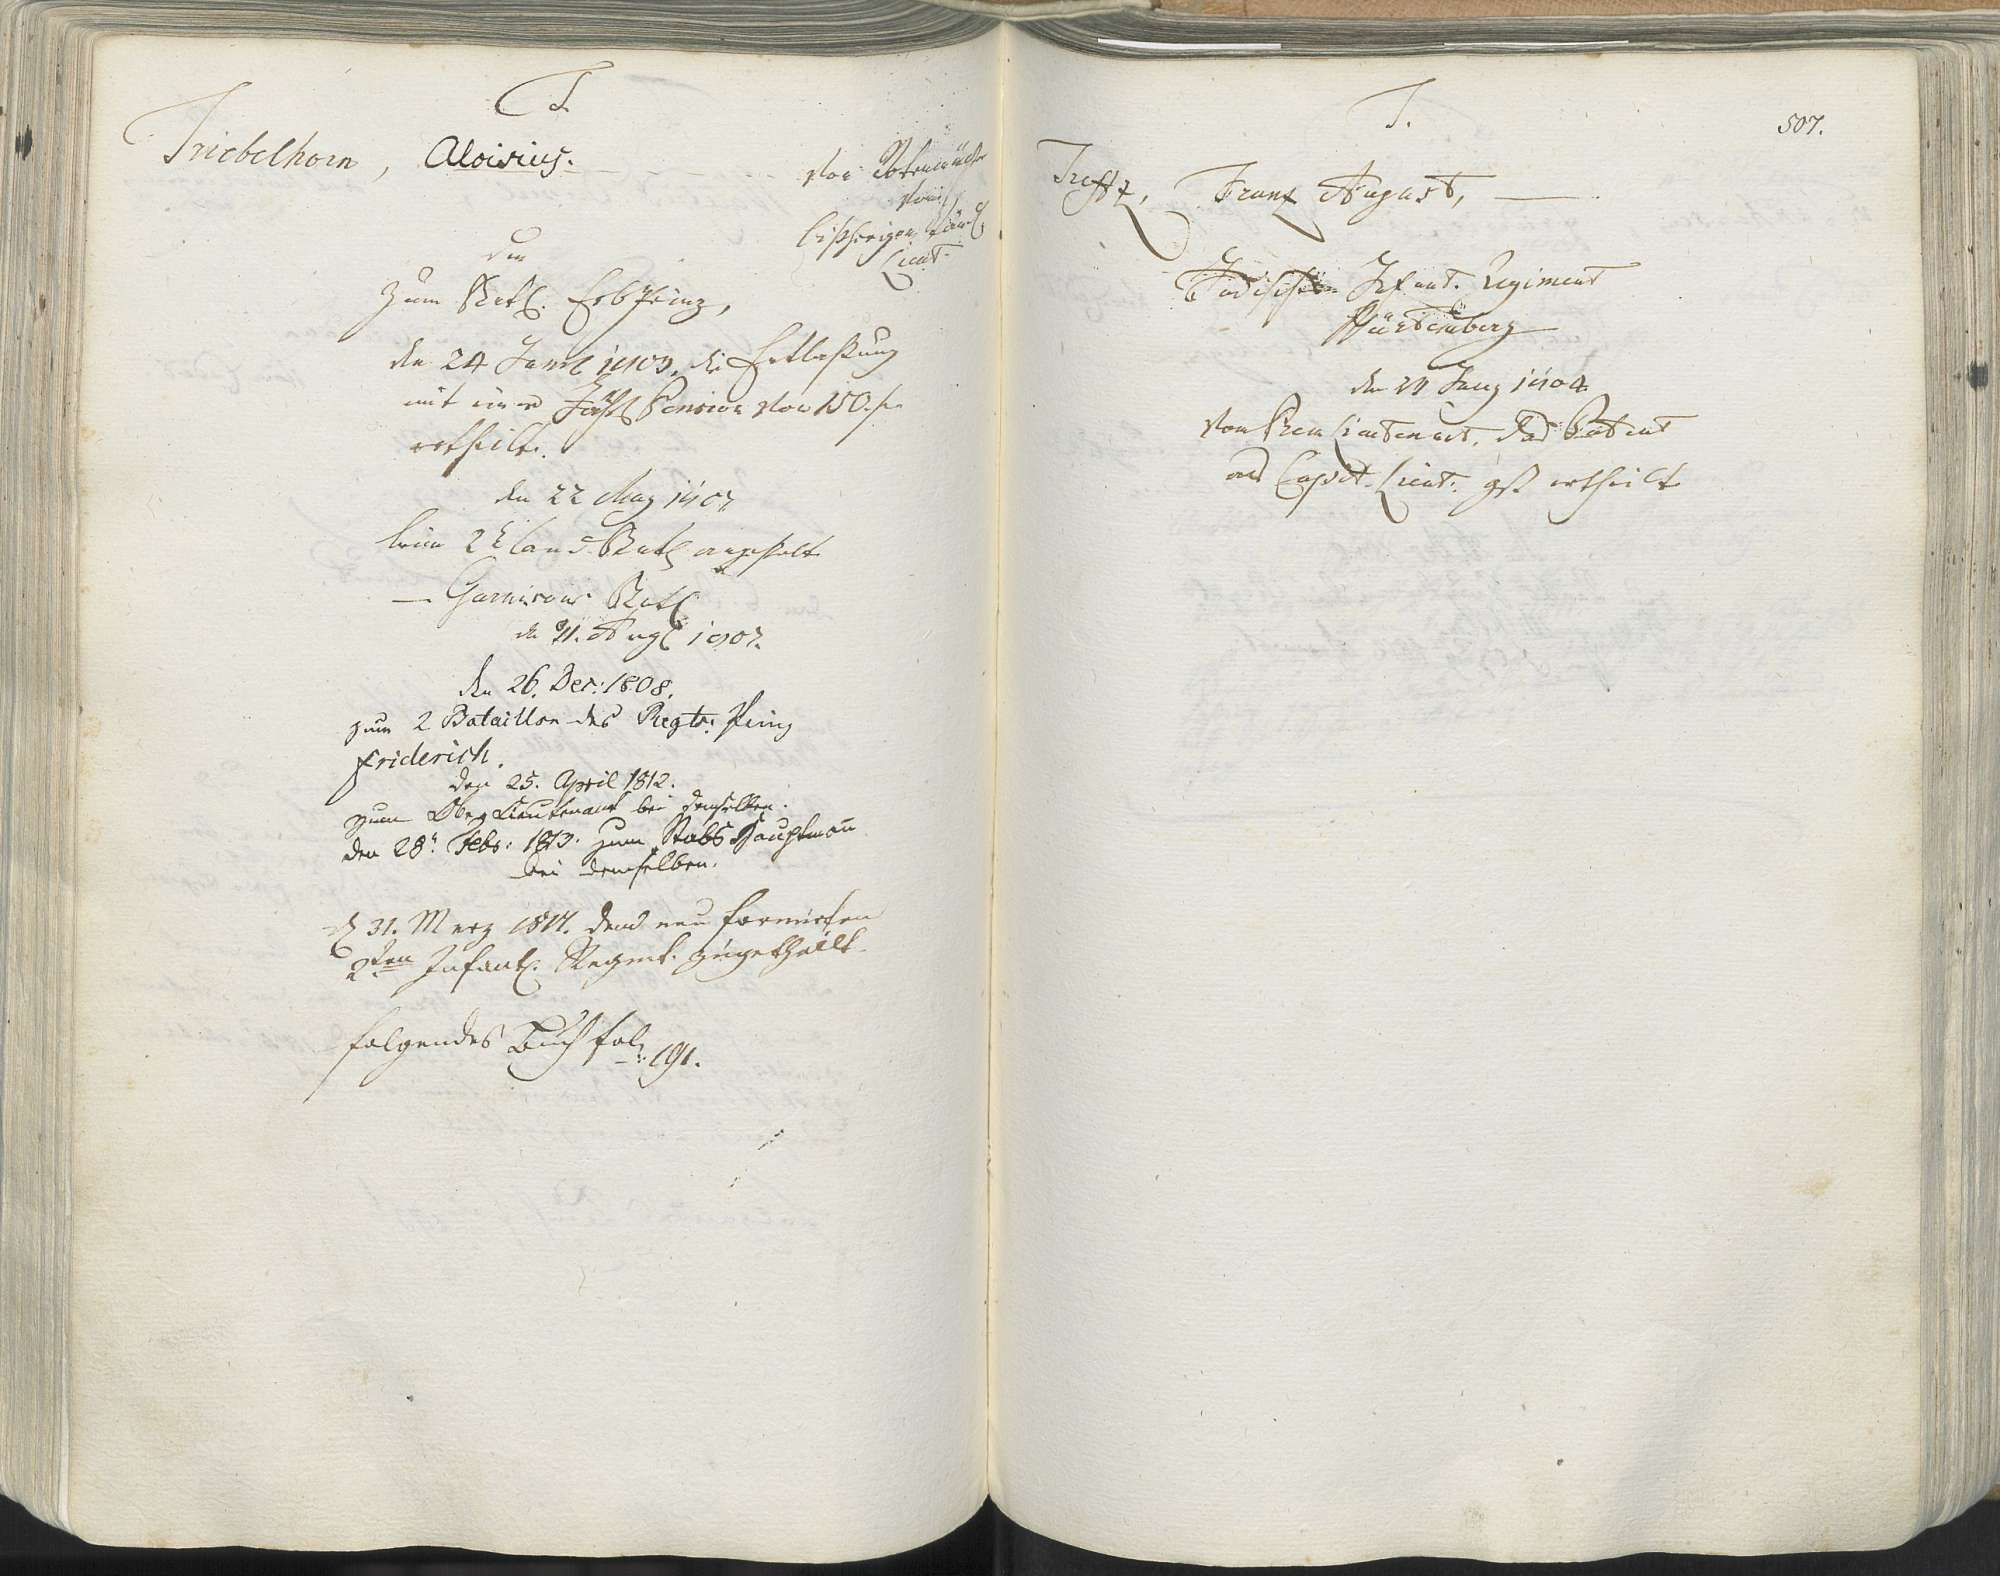 Triebelhorn, Aloisius, Bild 1